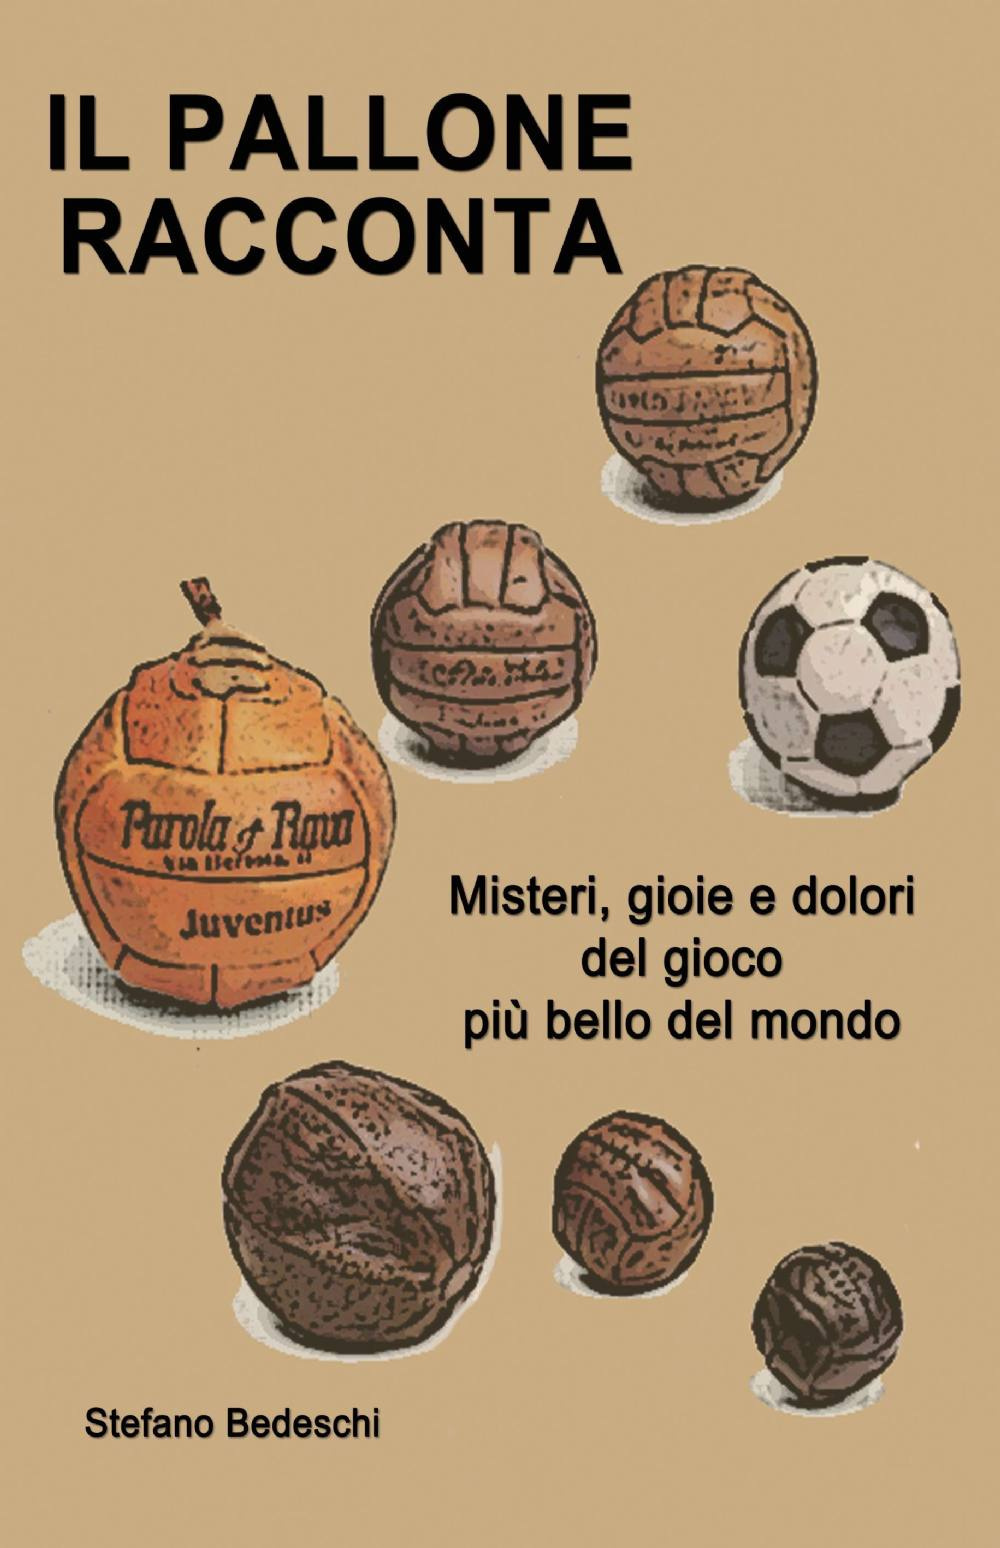 Image of Il pallone racconta